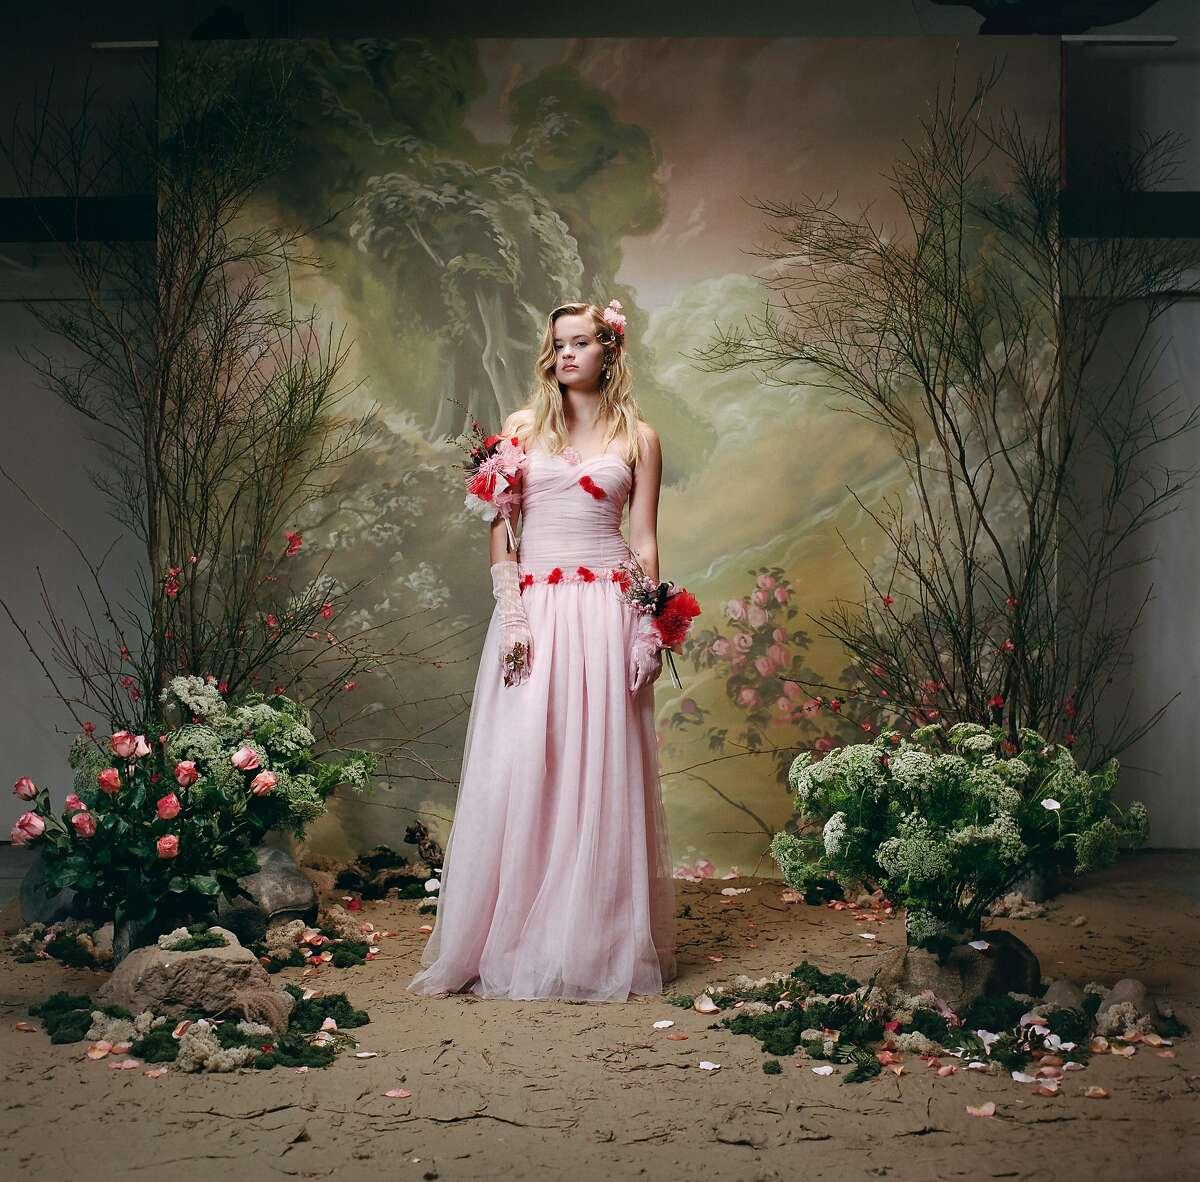 Ava Phillippe�photographed by Autumn de Wilde as part of Rodarte's Spring 2018 portrait series.